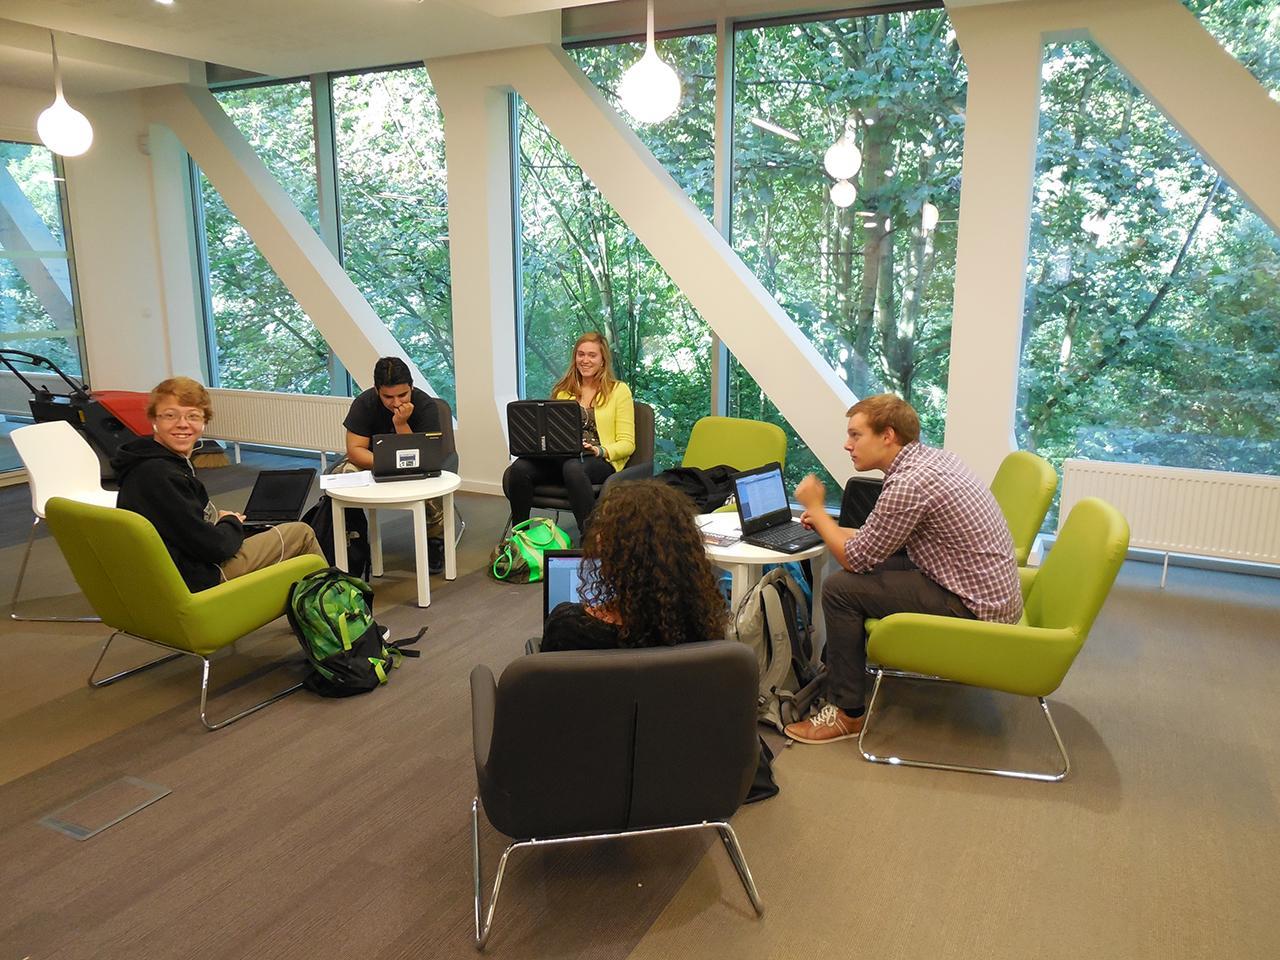 School Architecture Plan for International School of Brussels, Belgium by Education Design International